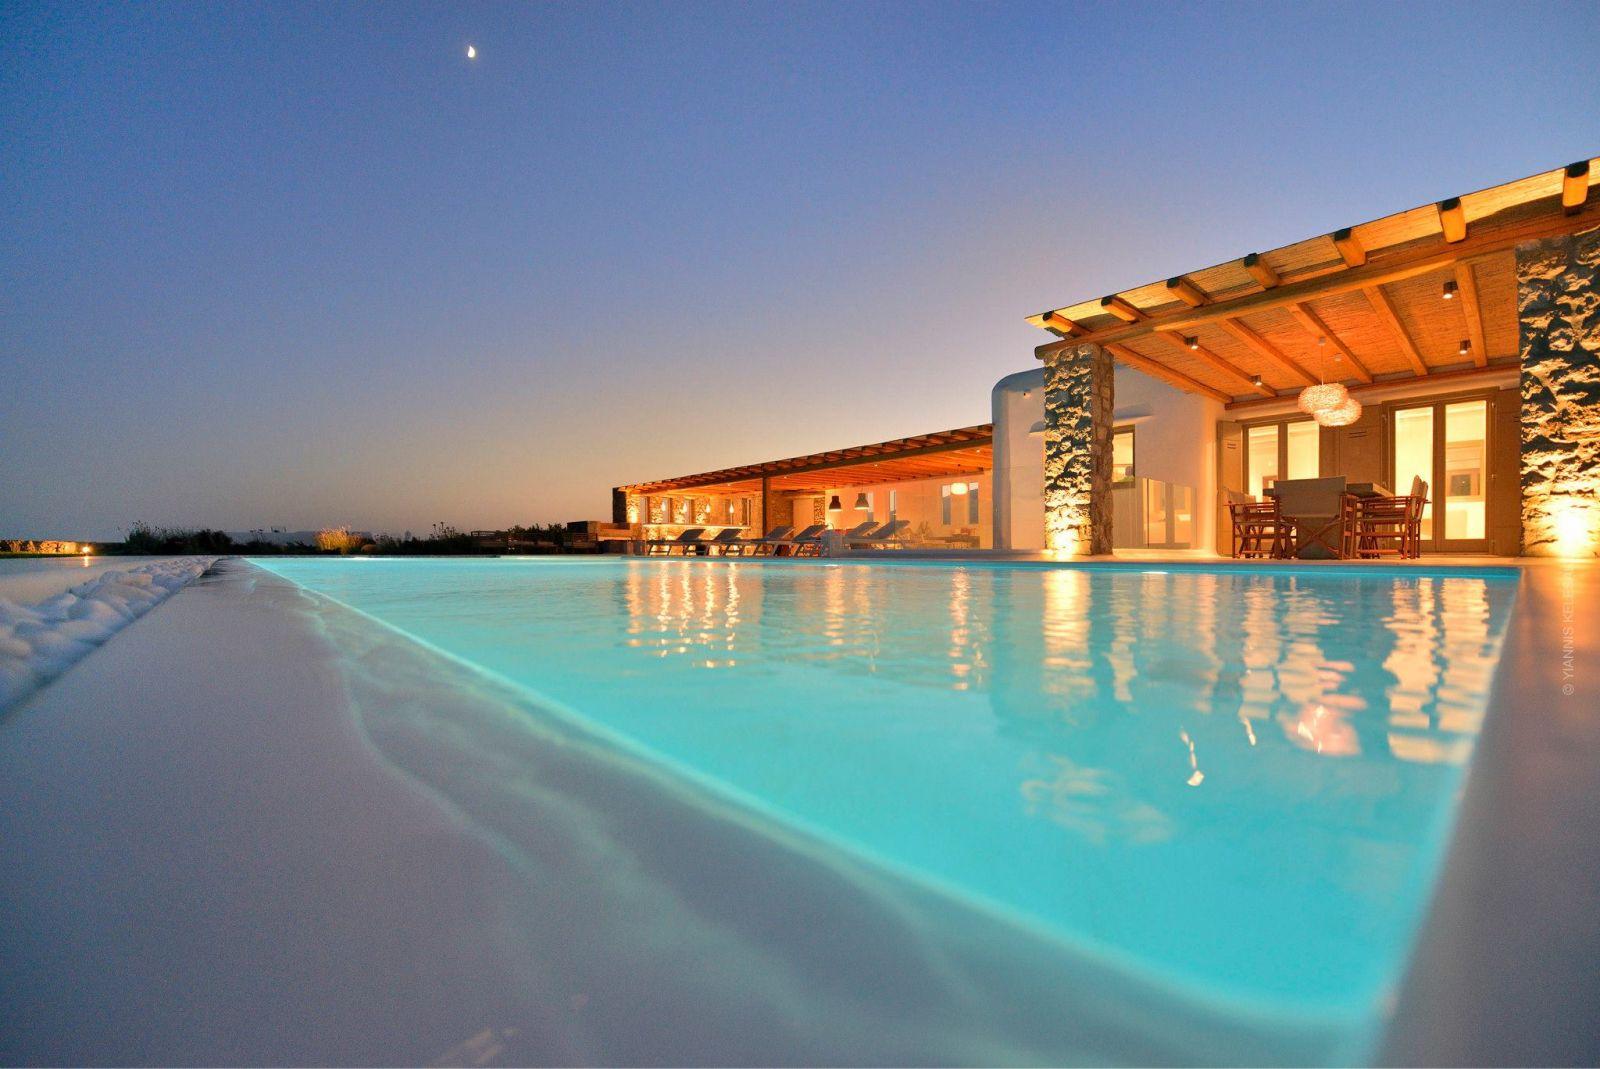 Перспектива покупки недвижимости в греции